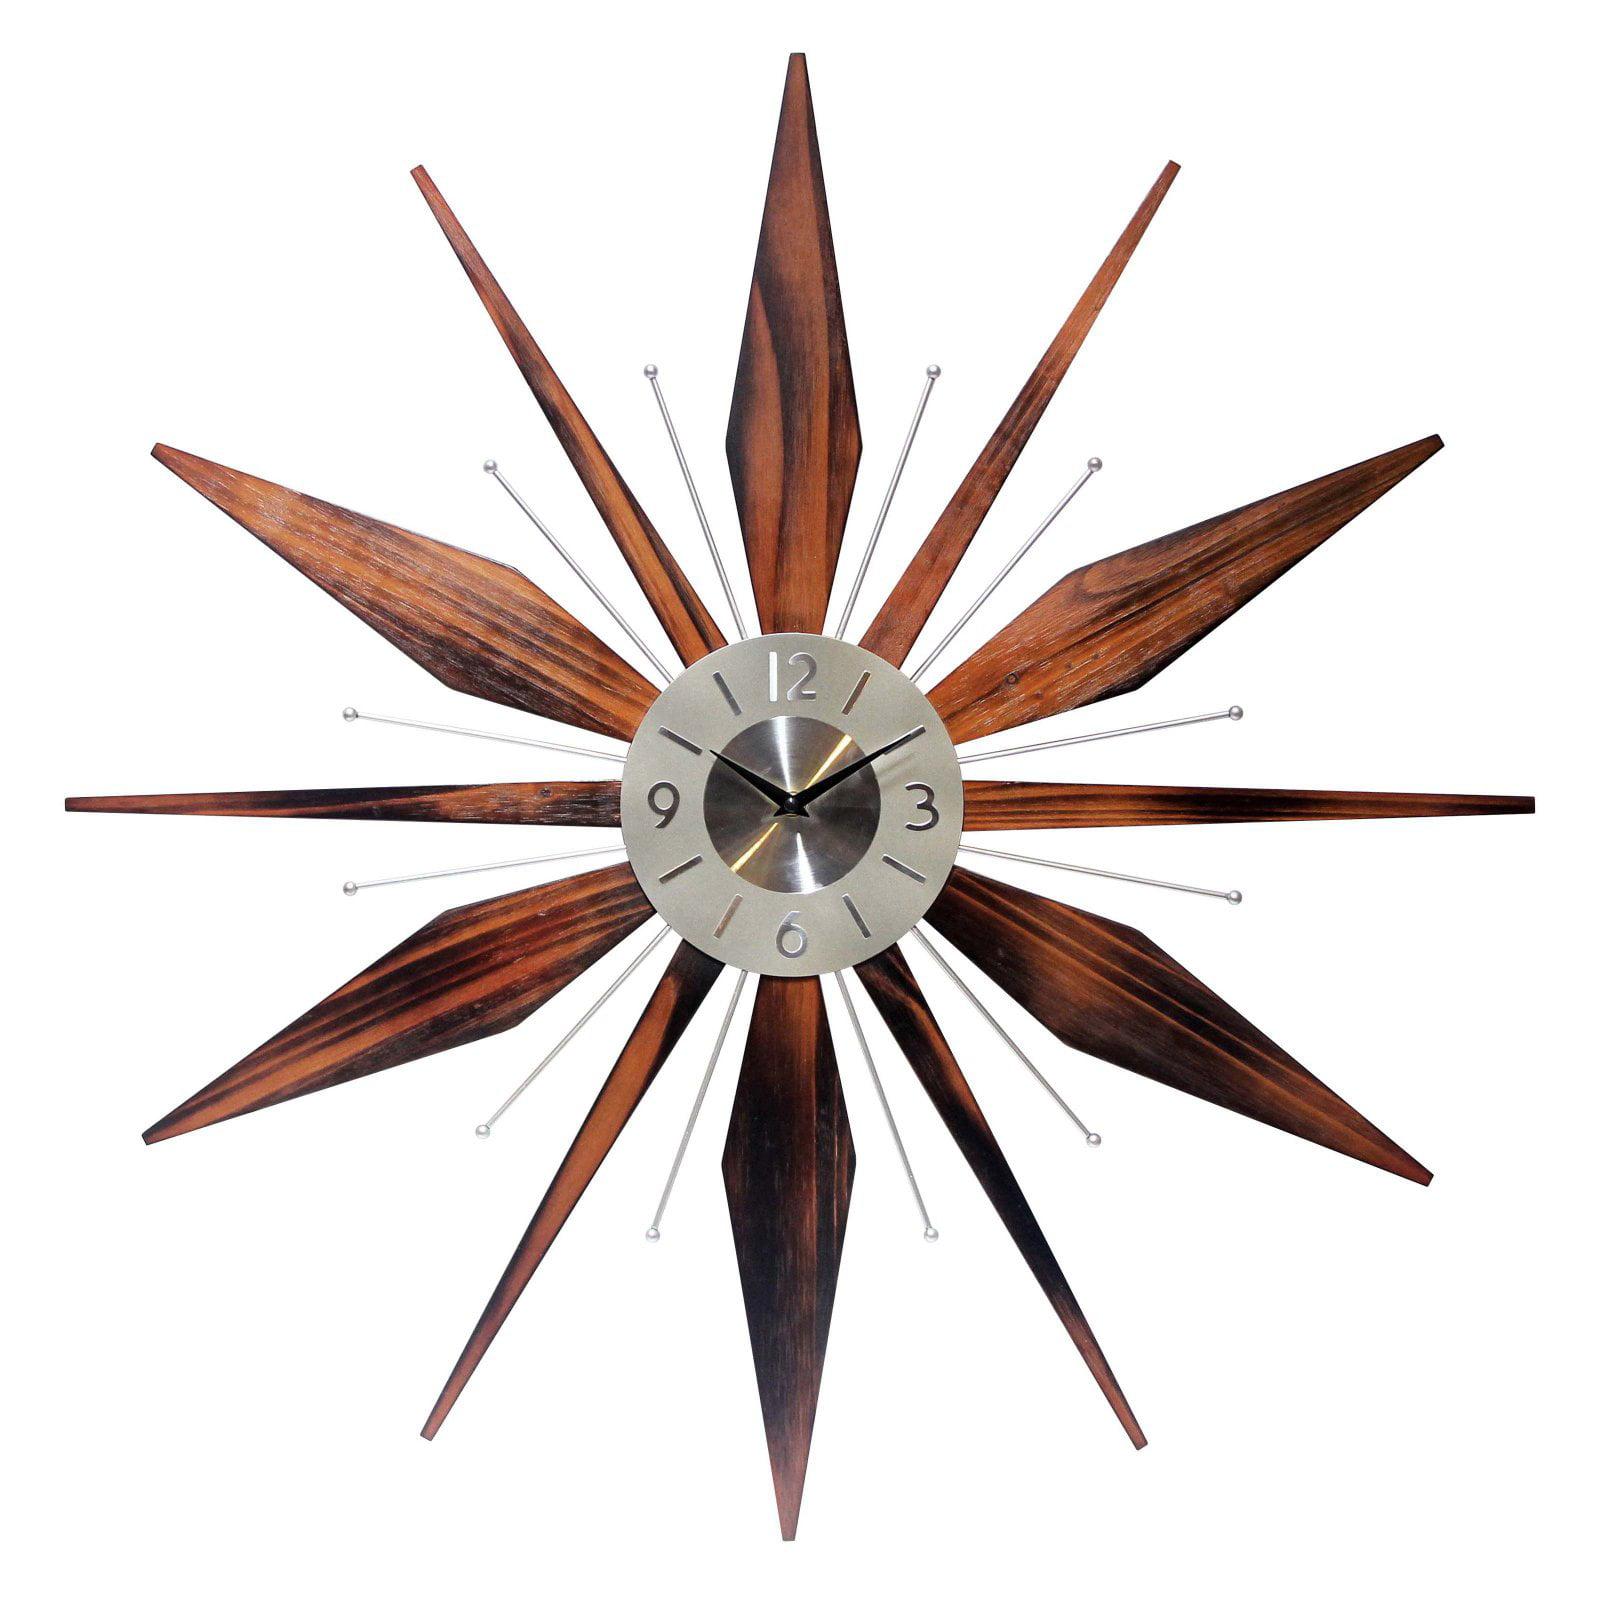 Details About Starburst Wall Clock Mid Century Og Metal Wood Retro Vintage Home W